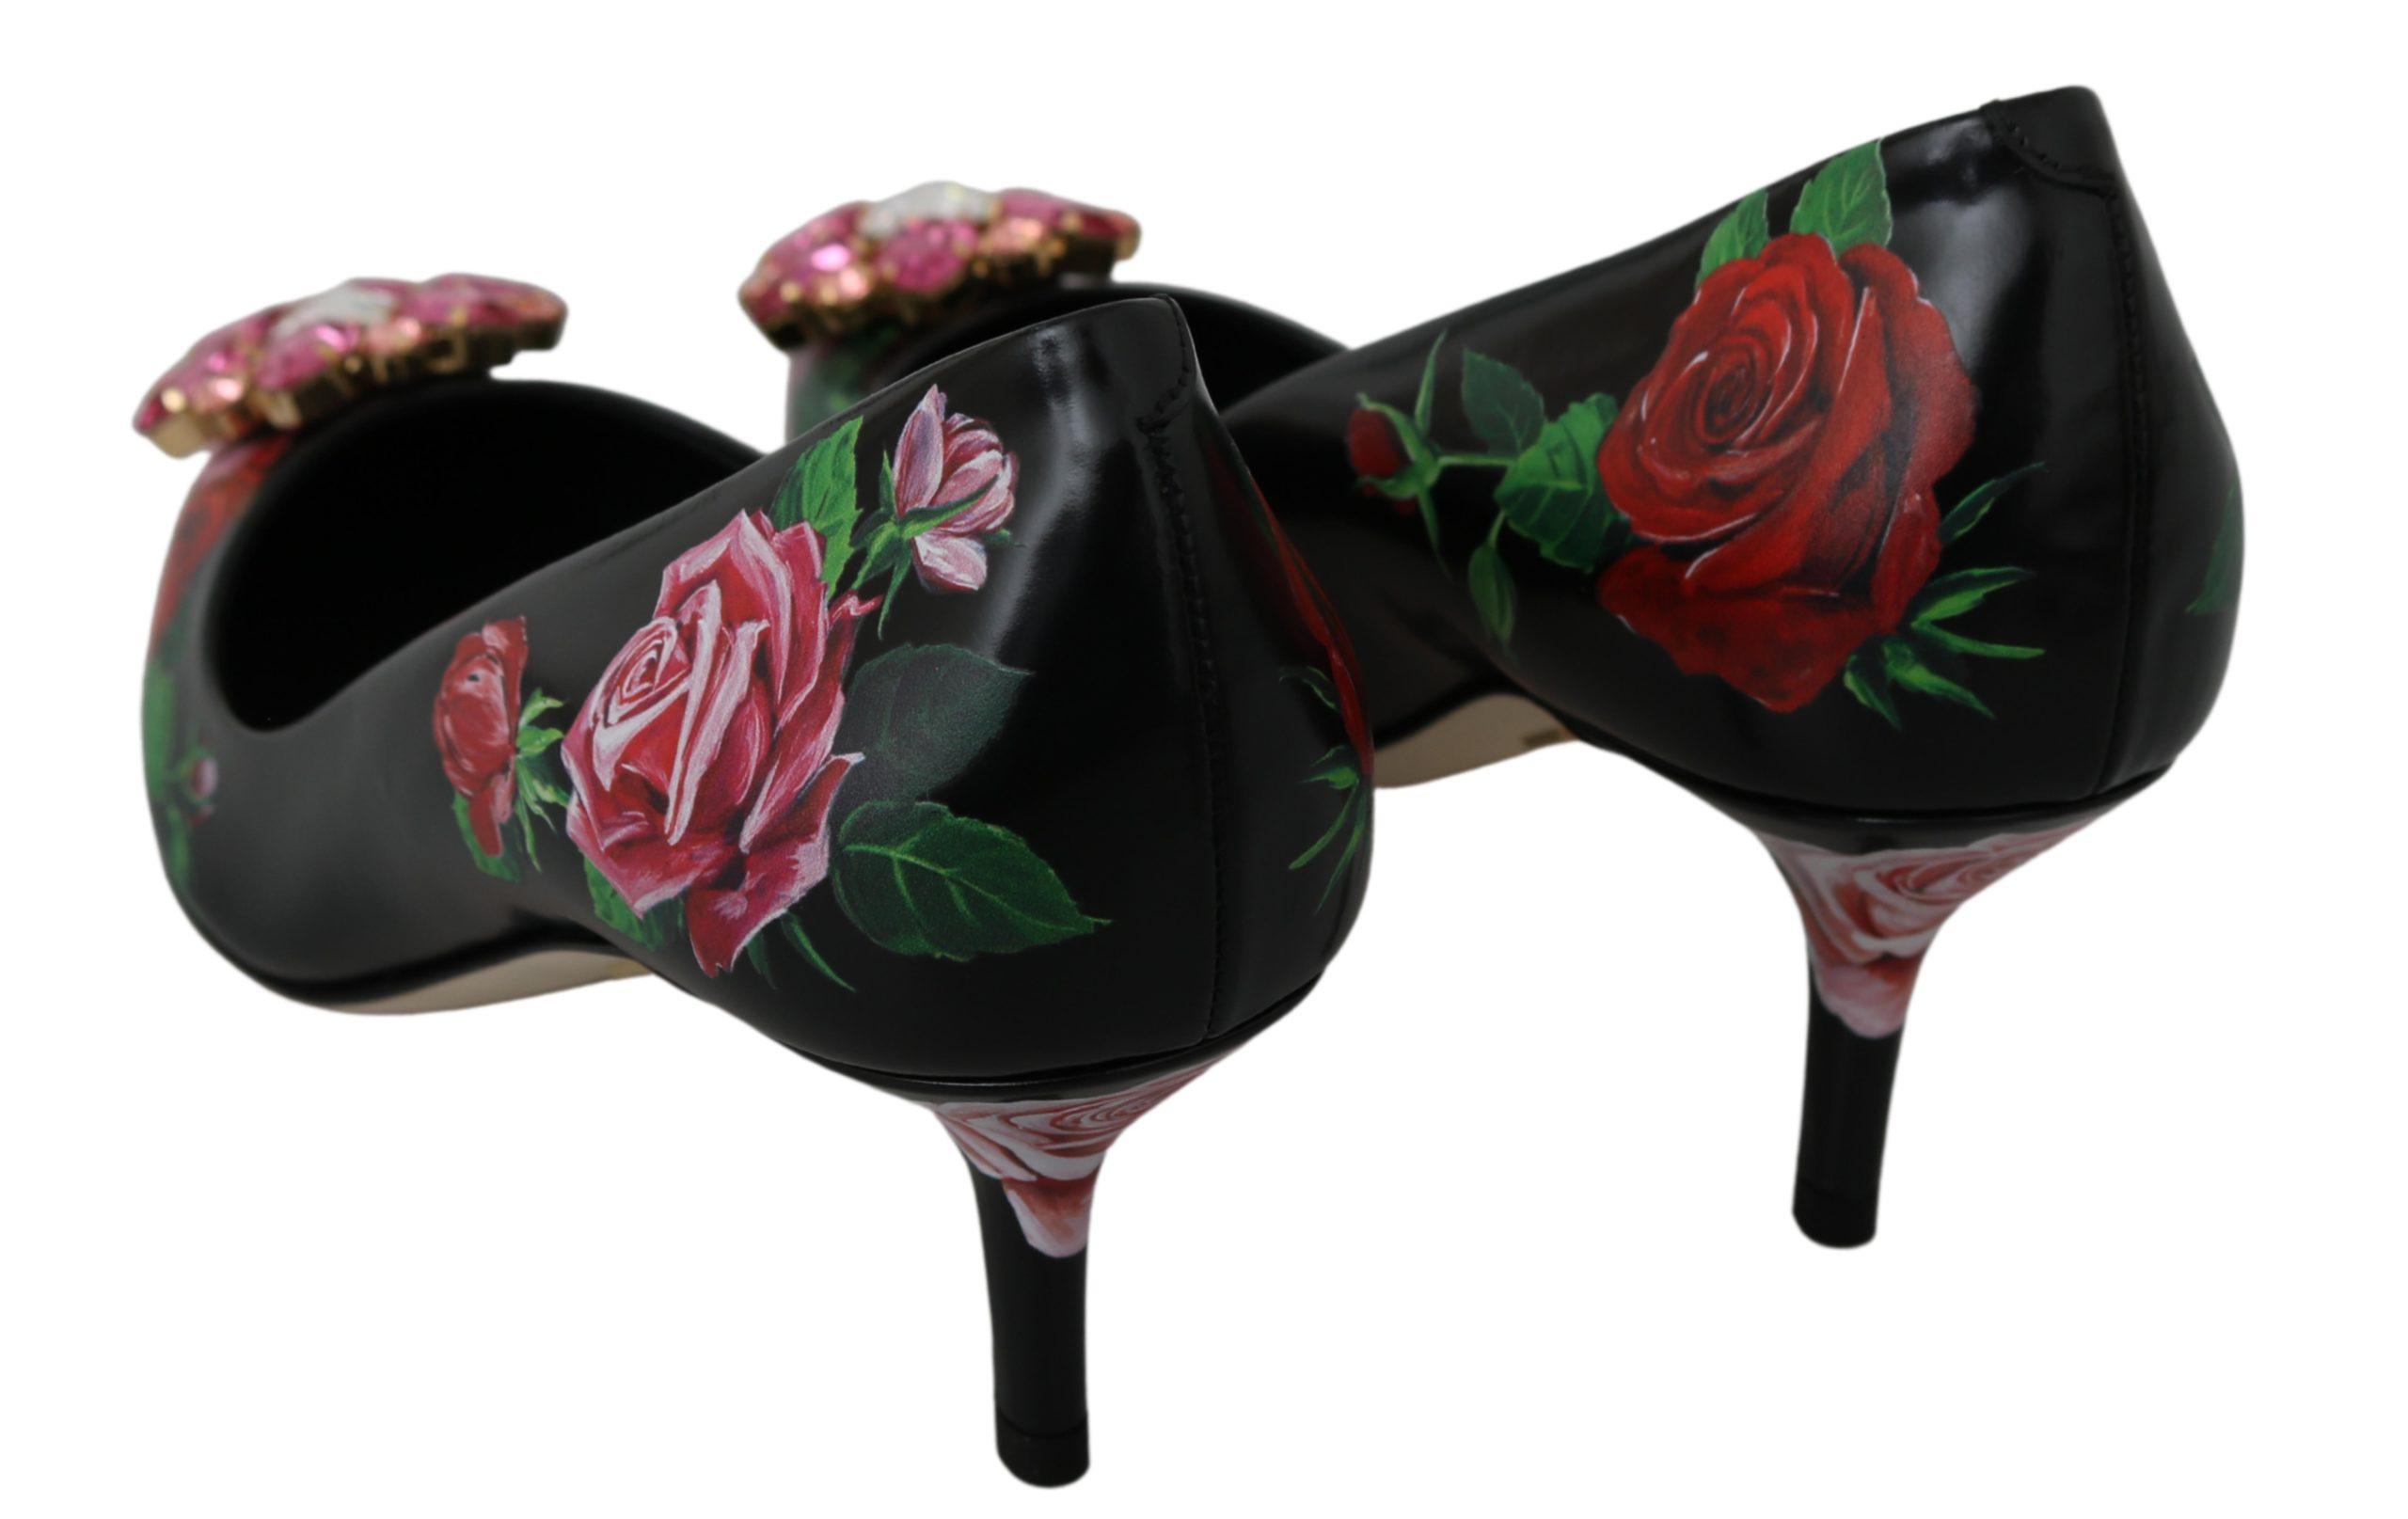 Dolce & Gabbana Women's Leather Crystal Roses Pumps Black LA6584 - EU36/US5.5